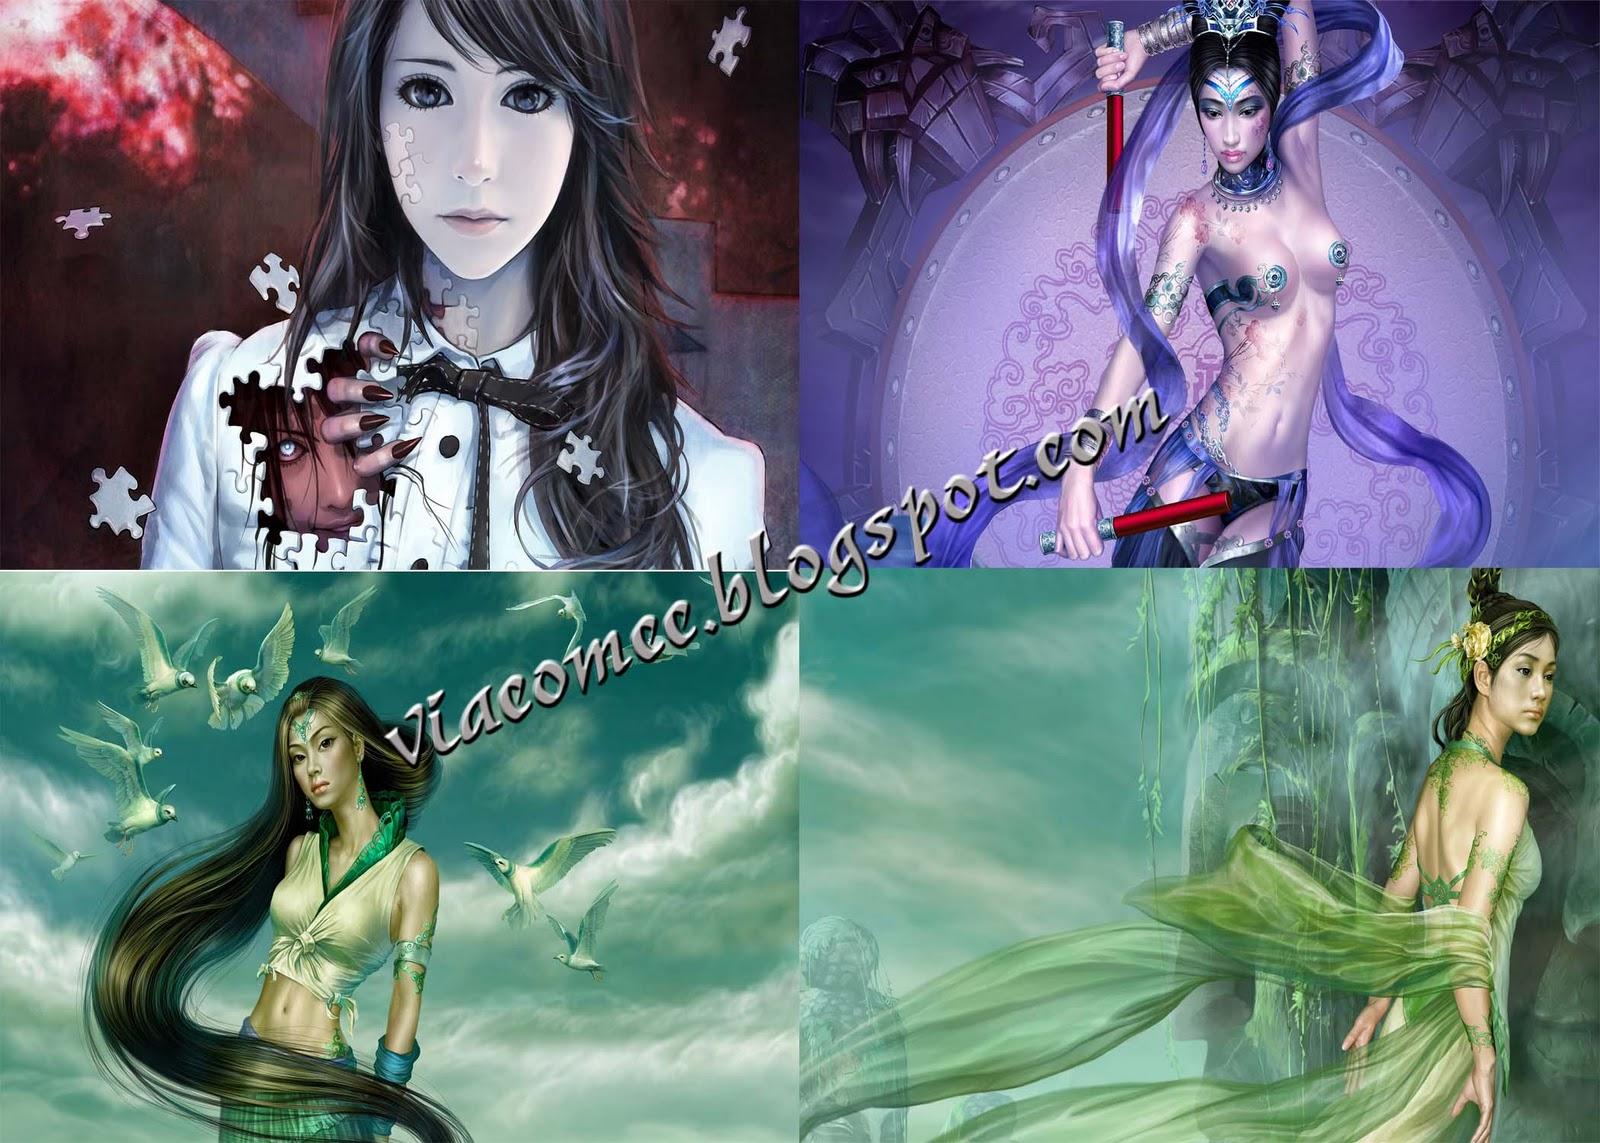 http://4.bp.blogspot.com/_RphxnciltFY/TM9DSrJVPgI/AAAAAAAAASA/B65YaADIzB0/s1600/Amazing+Girls+13-24.jpg